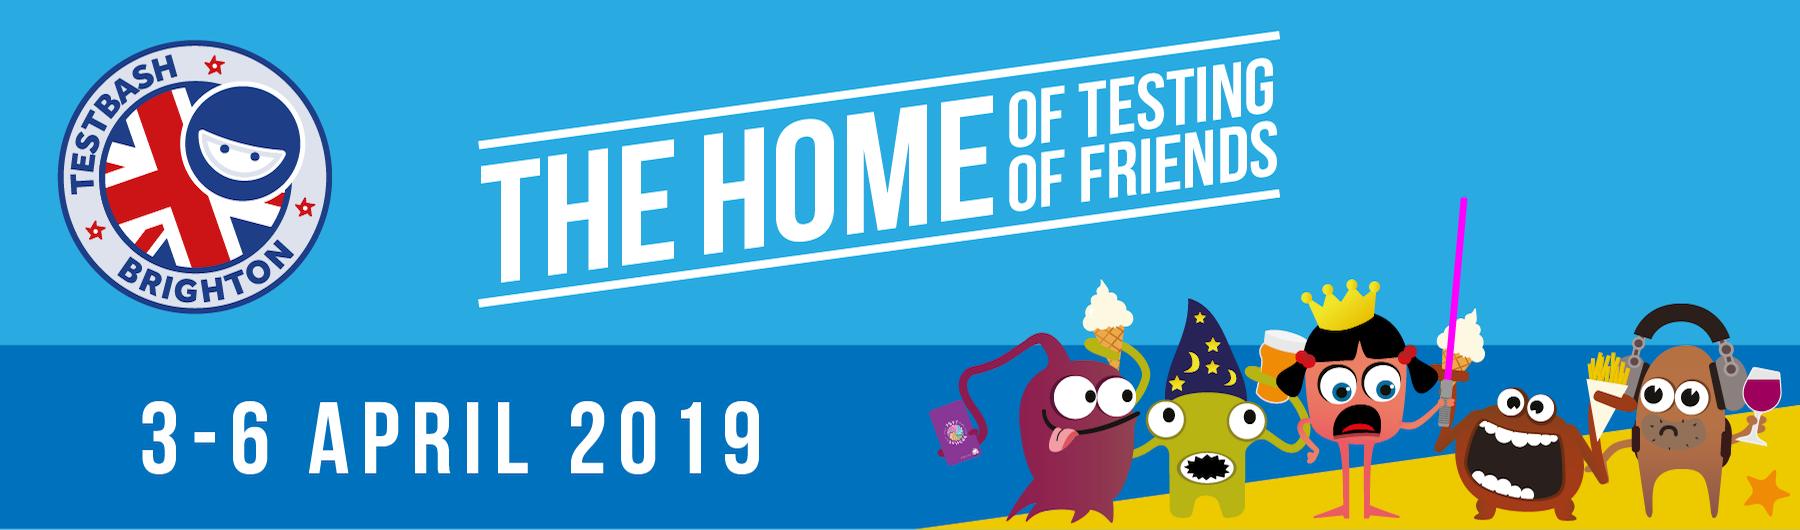 TestBash Brighton 2019